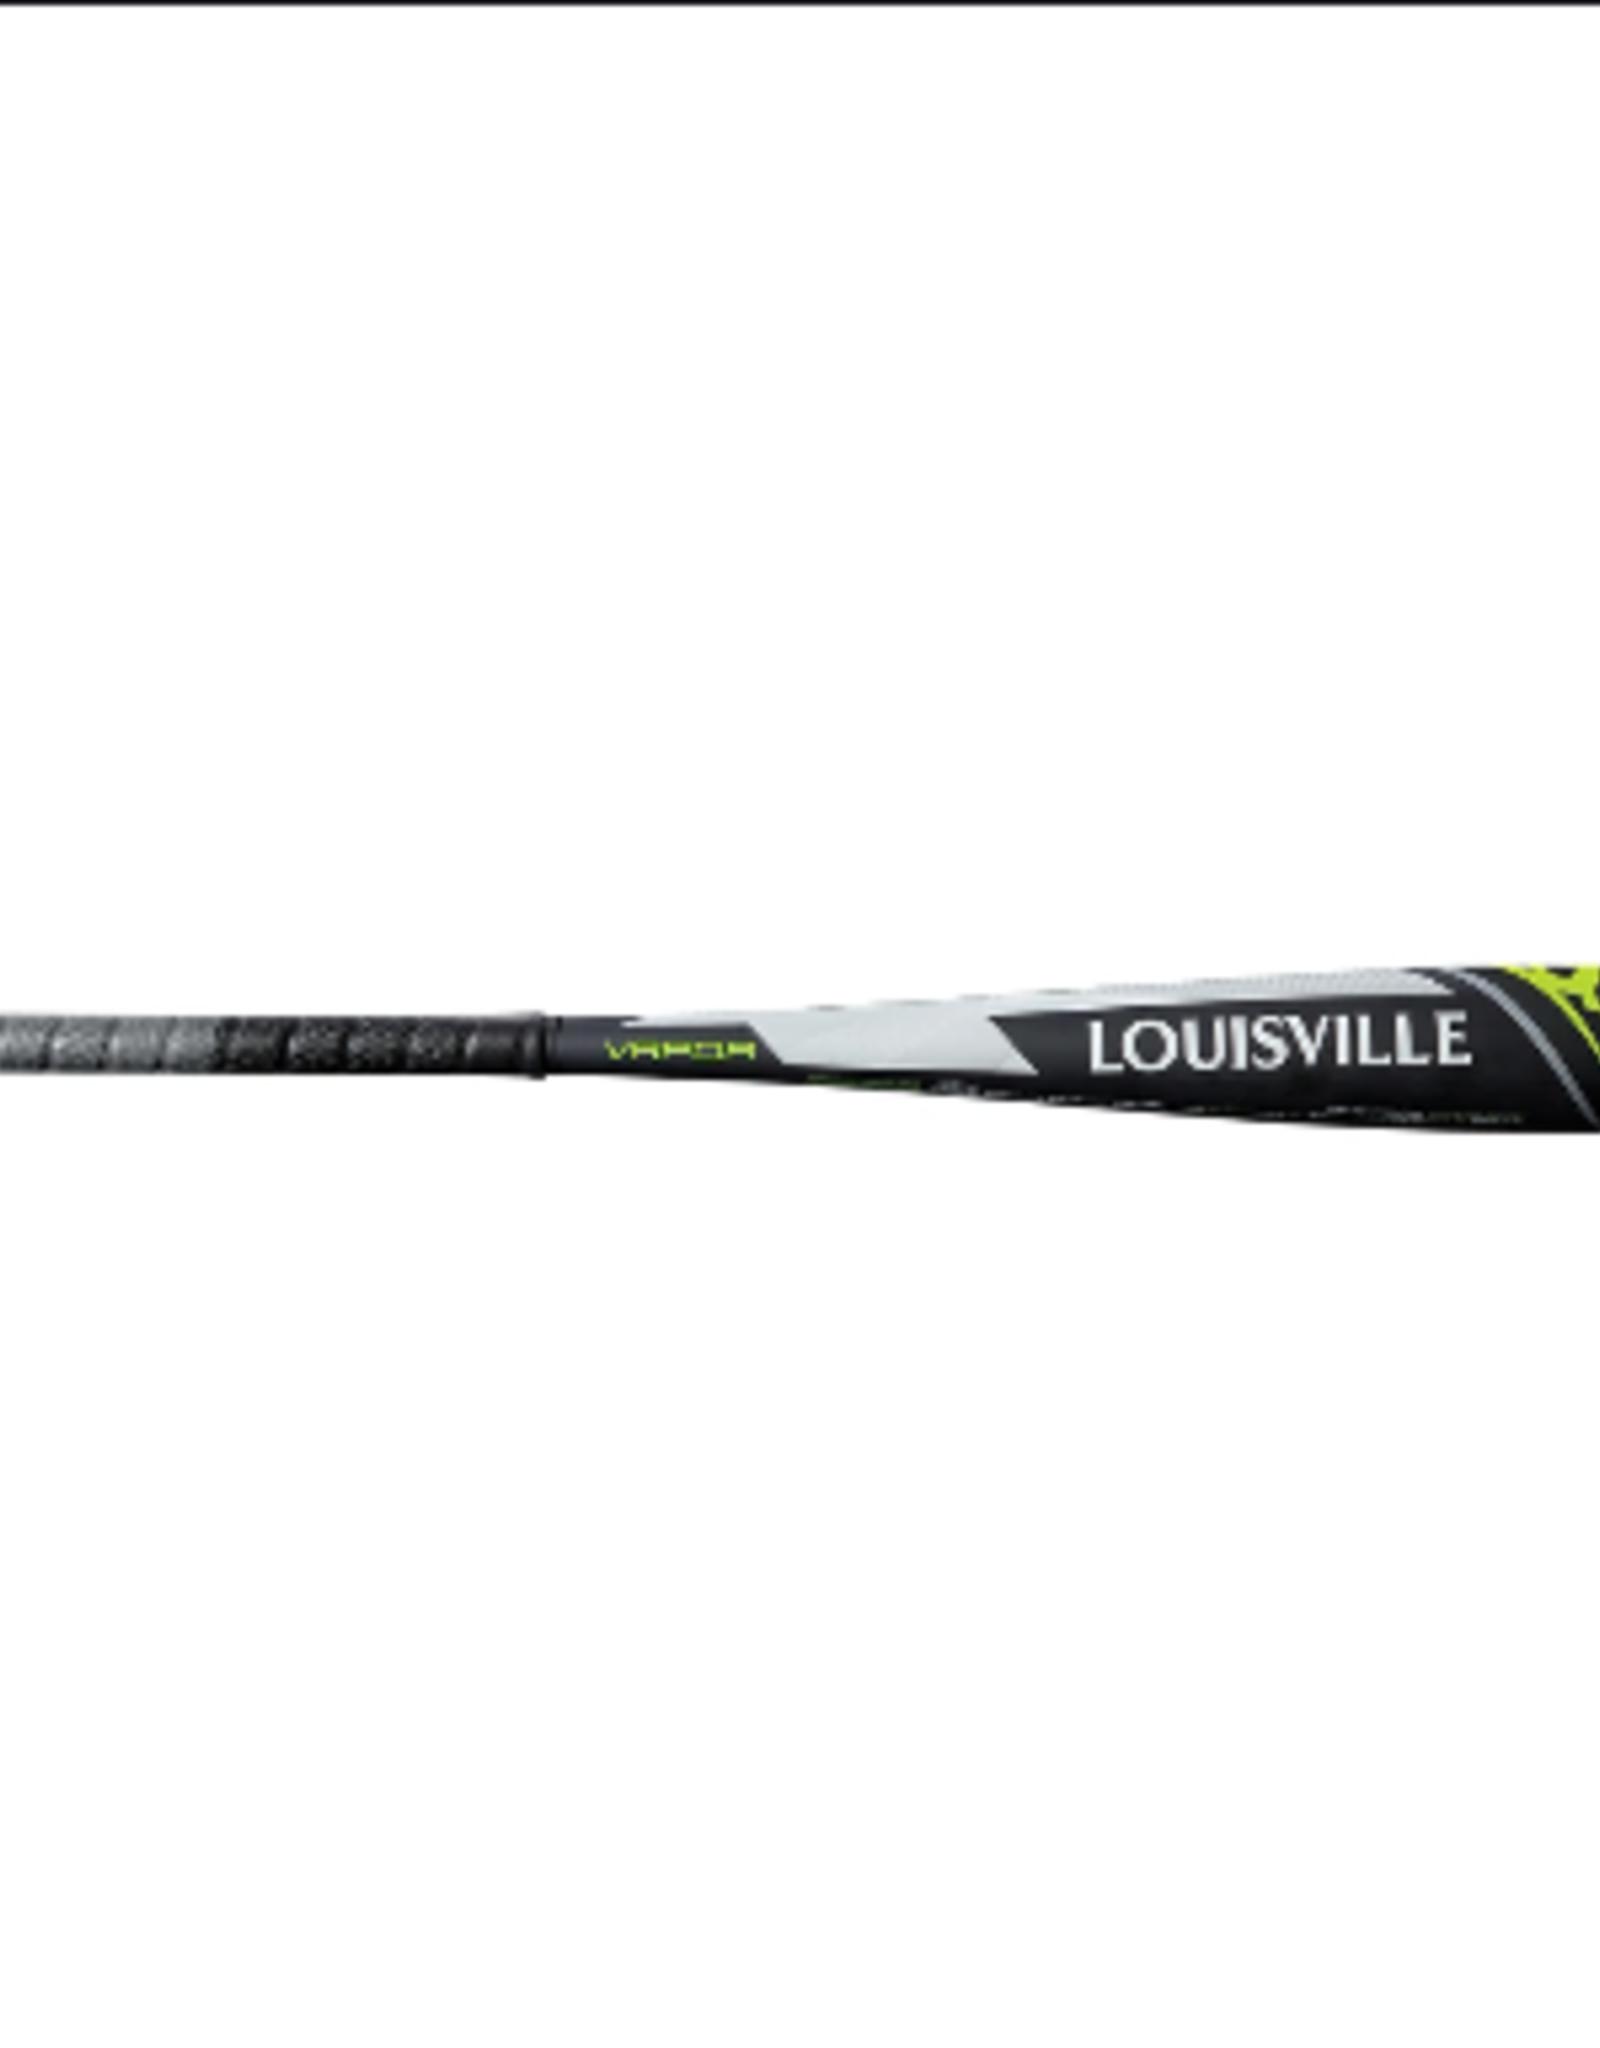 Louisville (Canada) LS LOUISVILLE SLUGGER NON WOOD BAT  USA BASEBALL VAPOR  9 2 5/8 USA BASEBALL 27 BLK-WHITE-GREEN